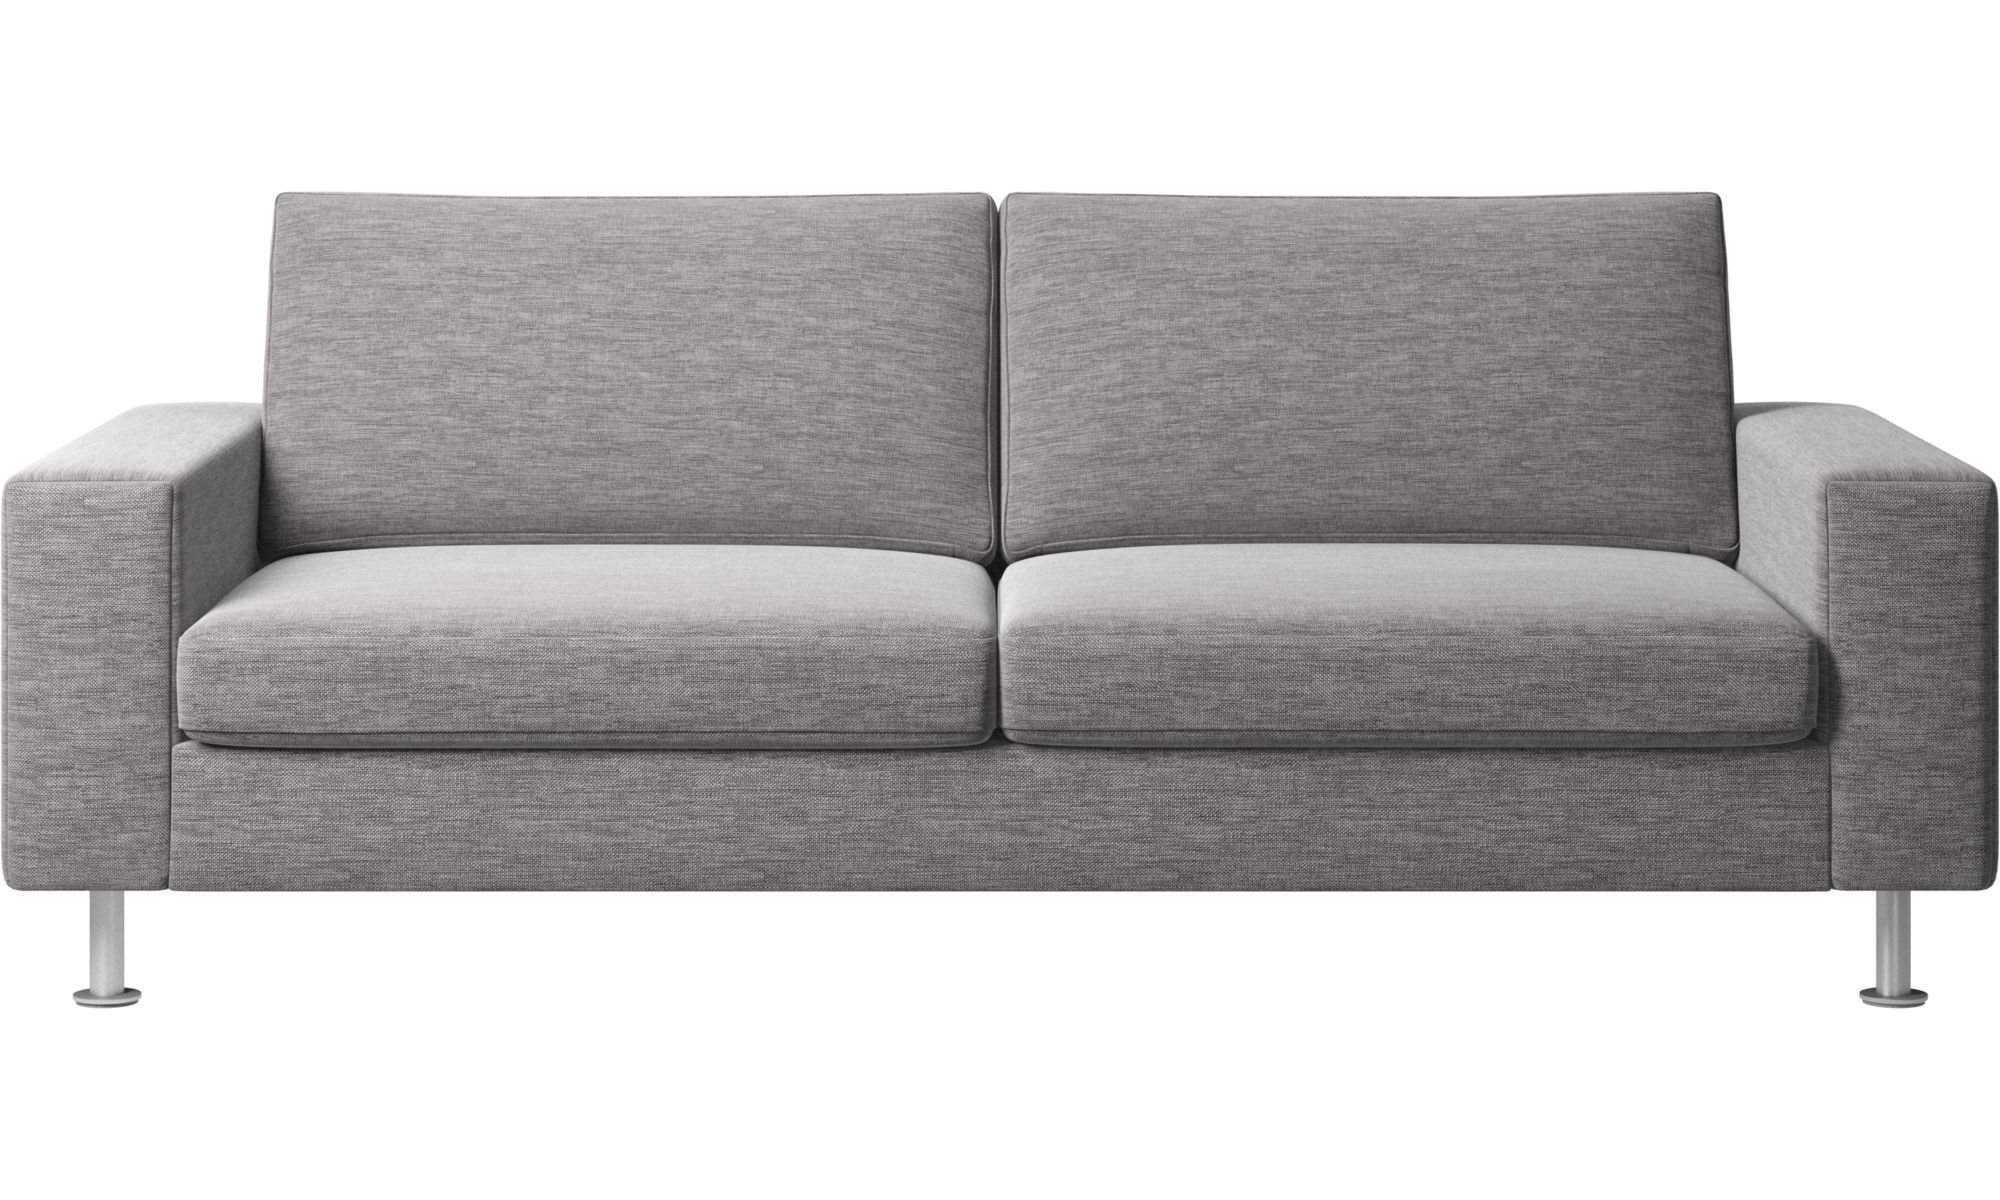 Indivi Sofa Bed Modern Sleeper Sofa Sofa Colors Boconcept